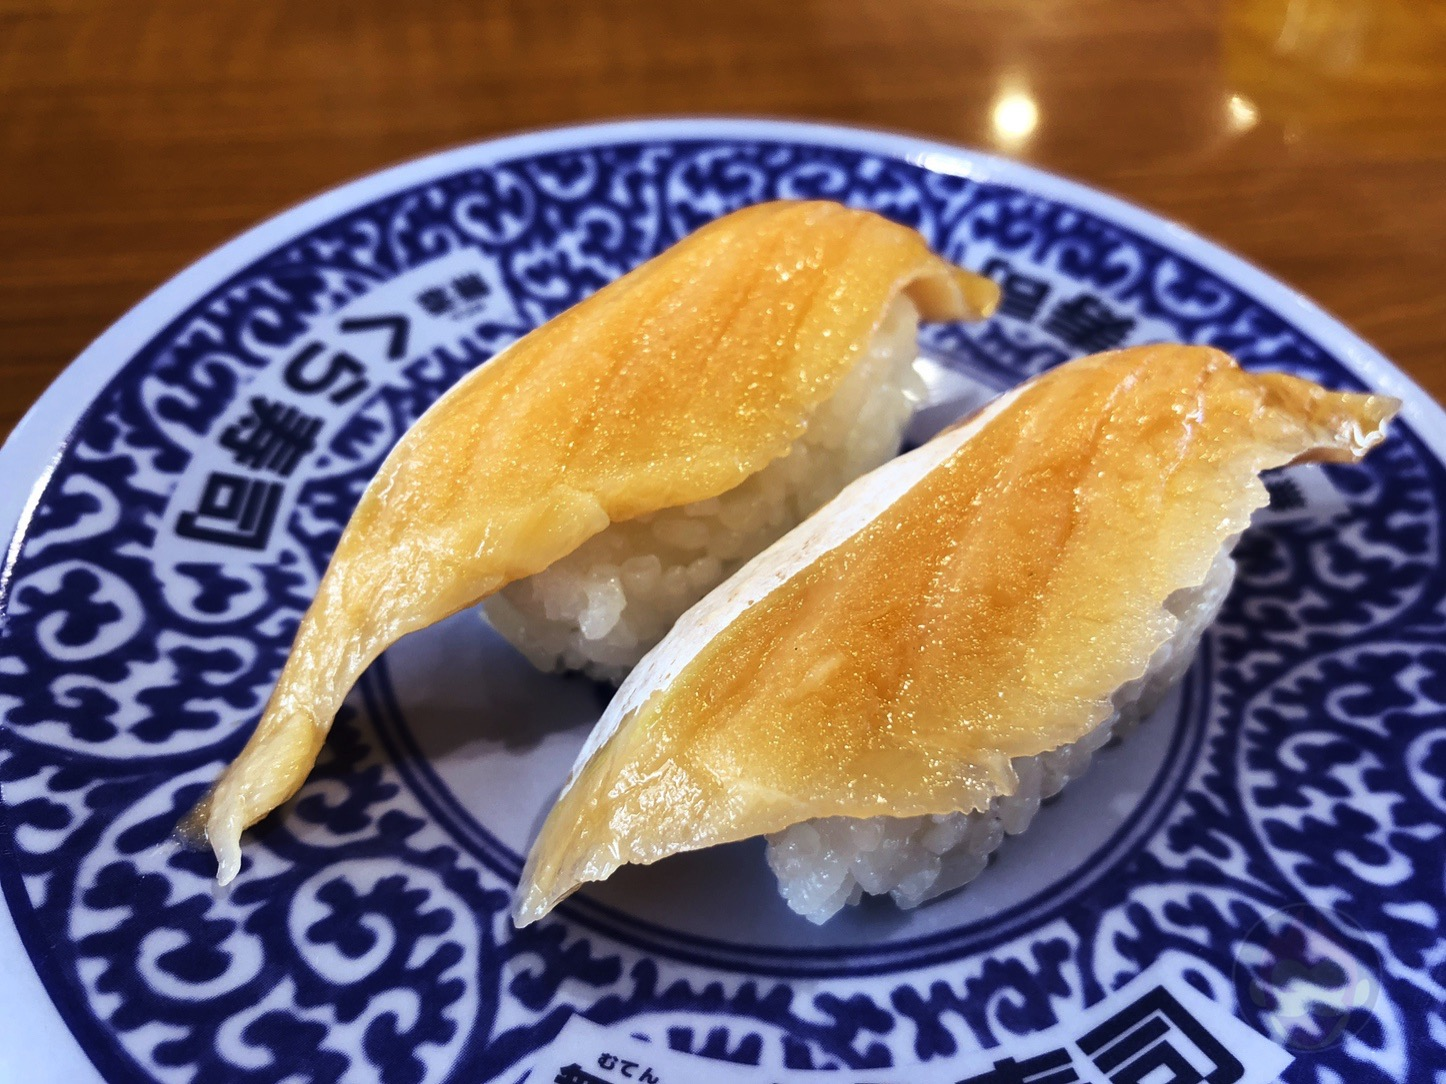 Kurazushi-Strange-but-tasety-menus-03.jpg